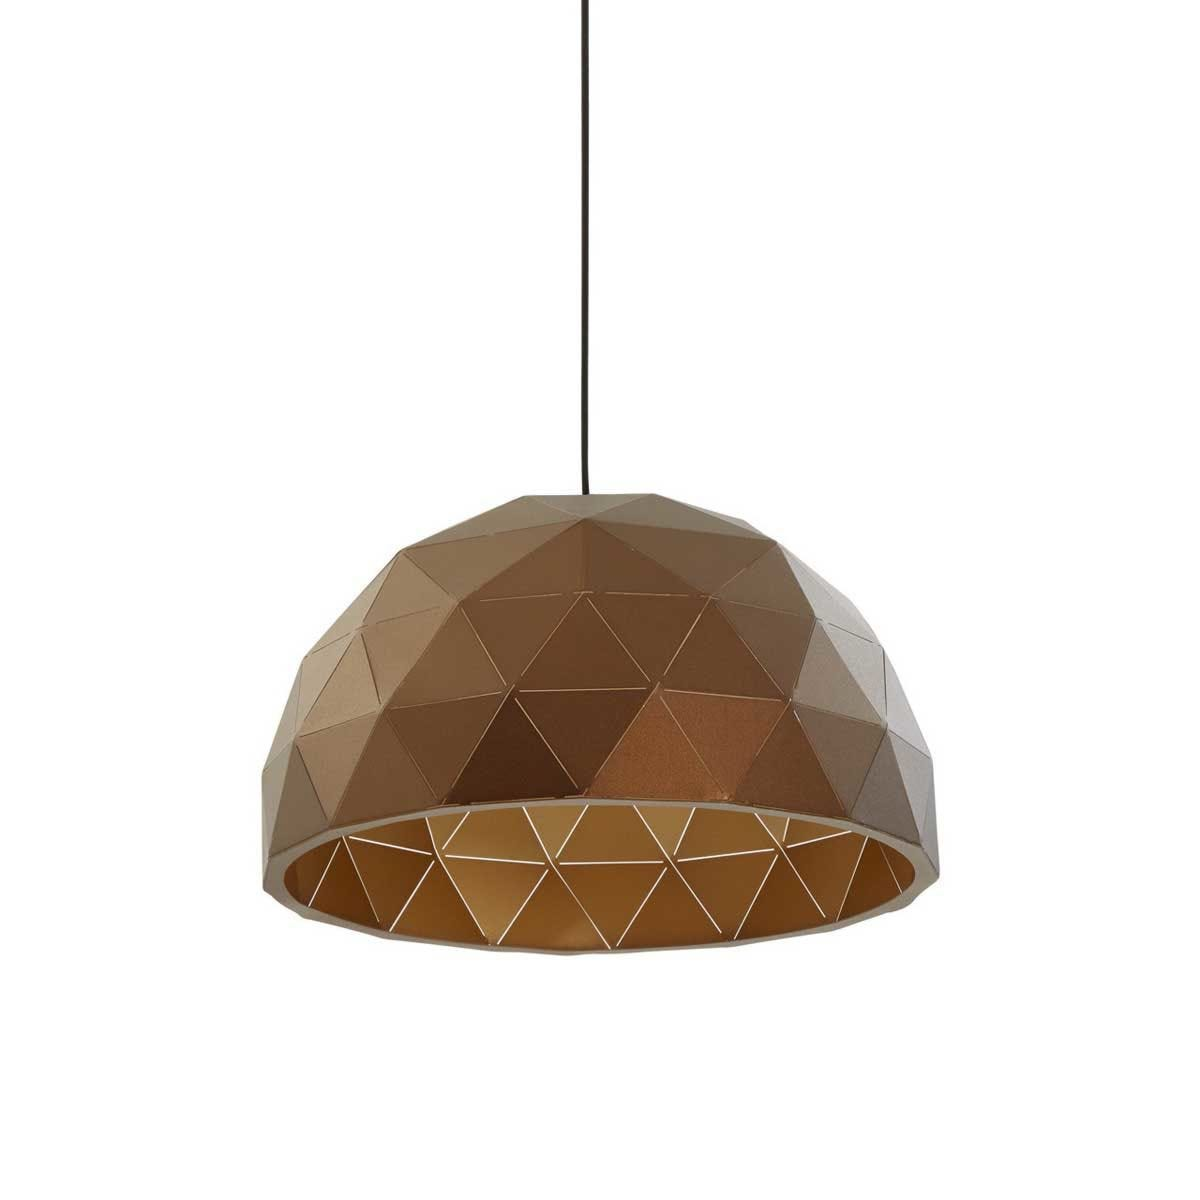 Premier Housewares Mateo Medium Dome Pendant Light - Brown